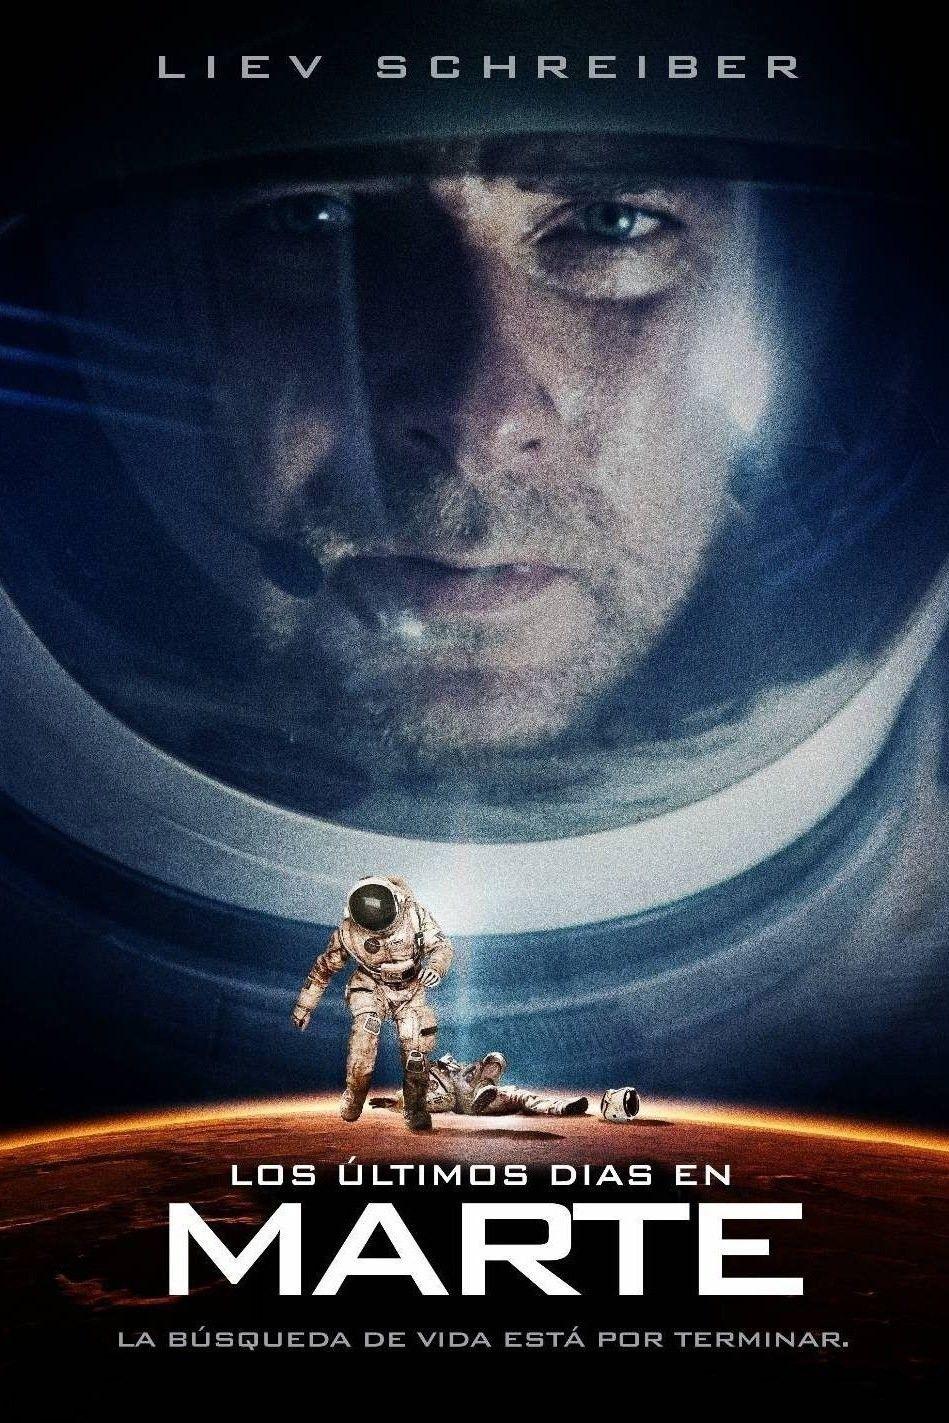 Los últimos días en Marte (2013) - Ver Películas Online Gratis - Ver Los últimos días en Marte Online Gratis #LosúltimosDíasEnMarte - http://mwfo.pro/18381694